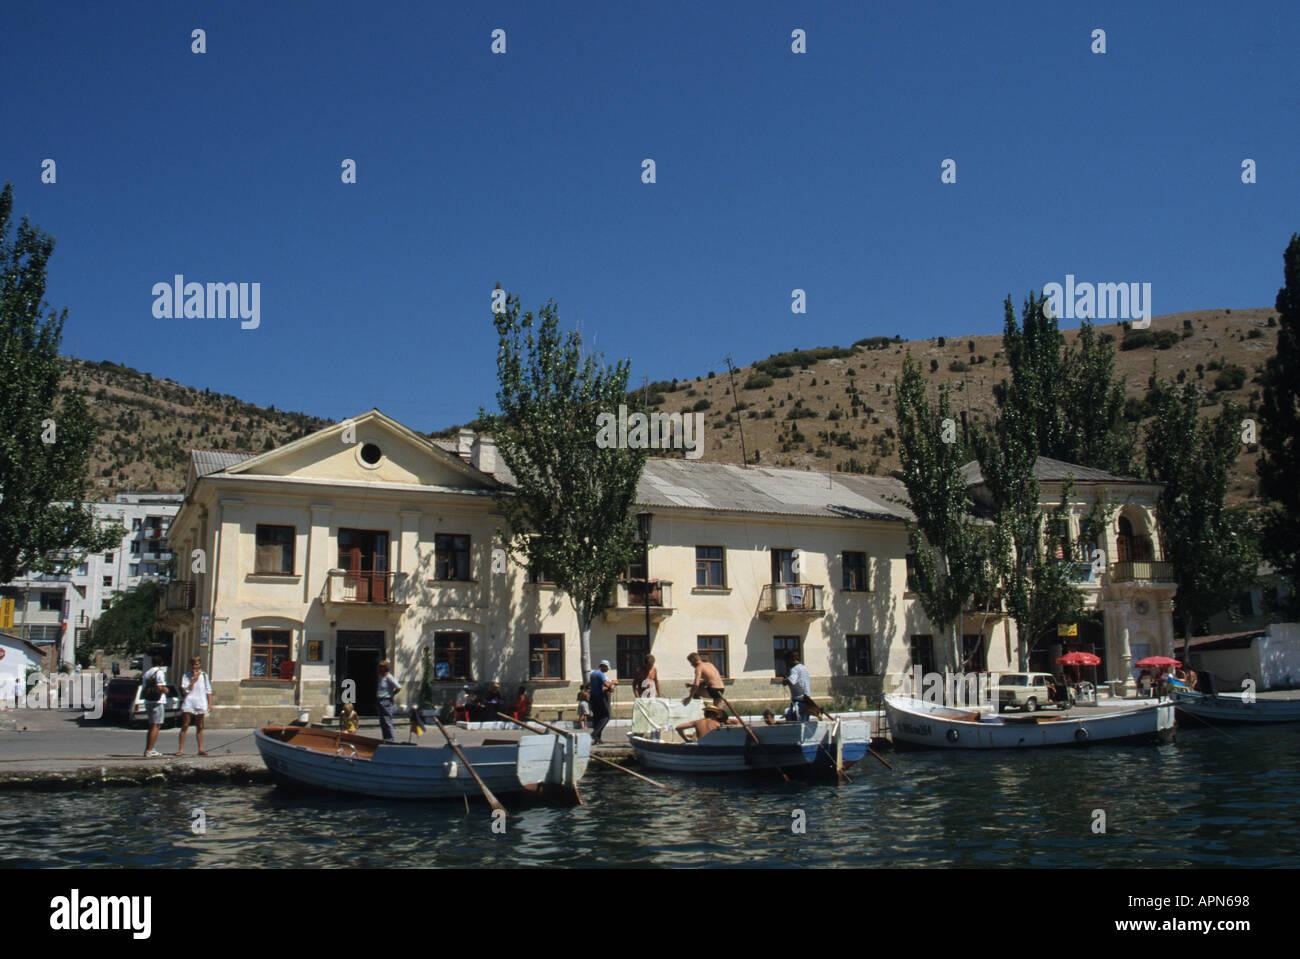 Old port of Balaclava in the Crimea on Ukraine s Black Sea coast - Stock Image